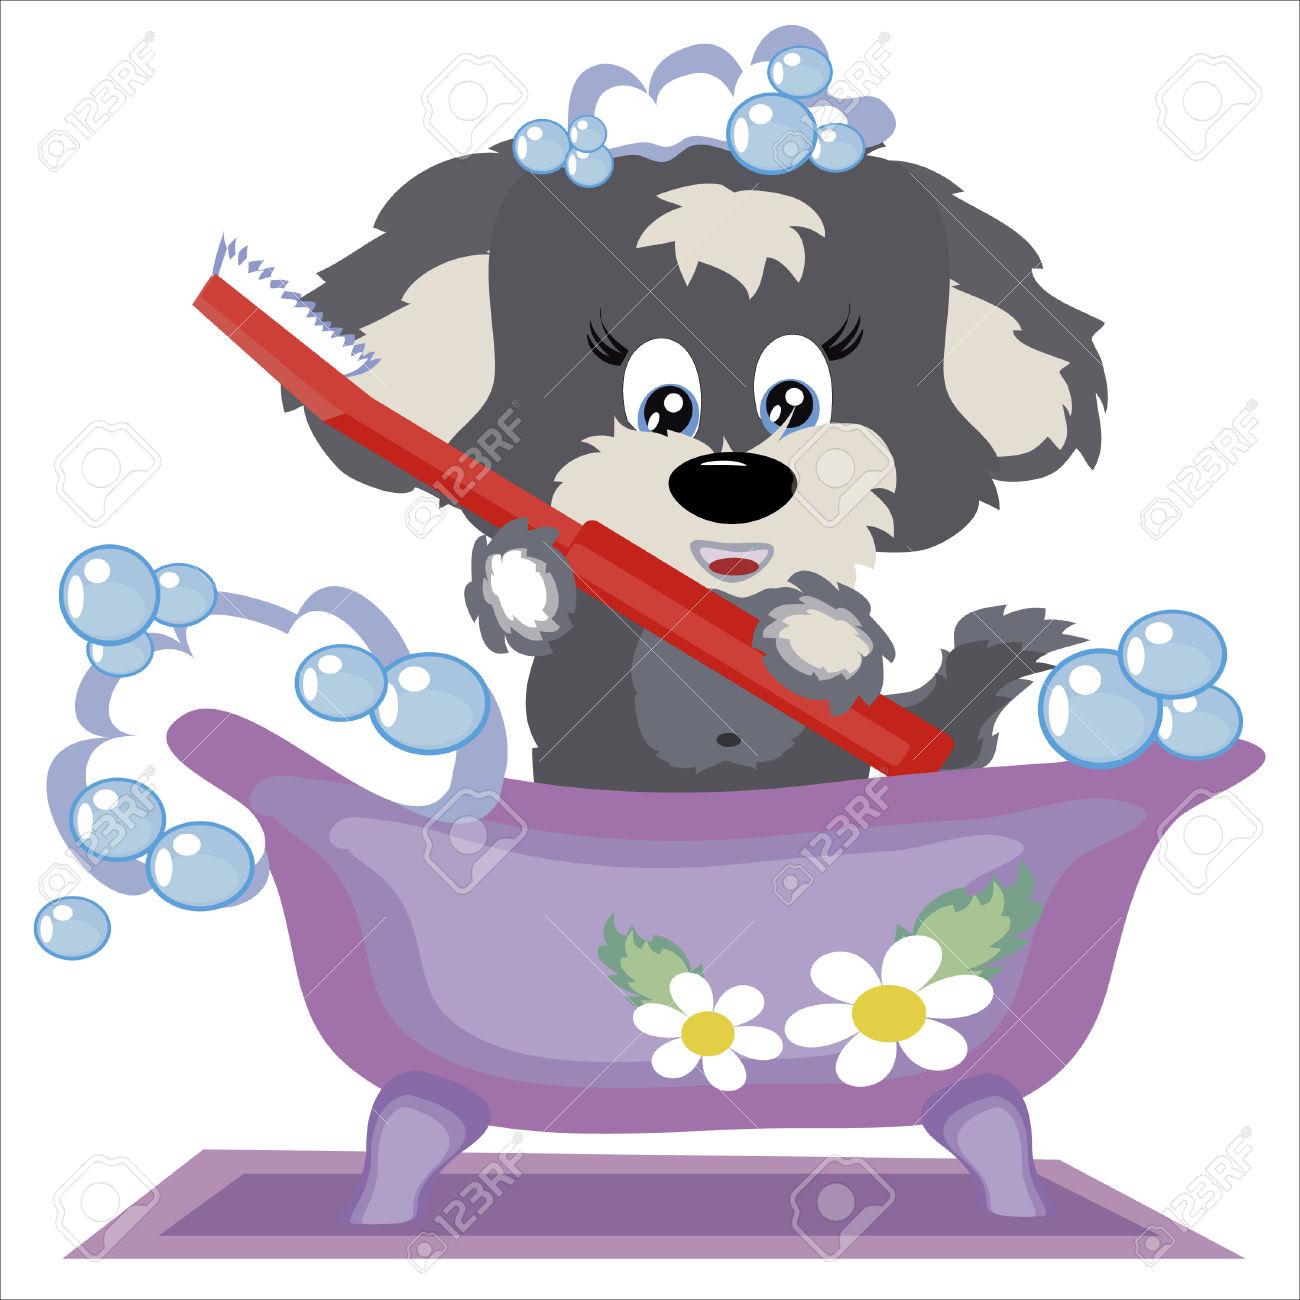 Bathtub clipart bathroom item. Picture of a ideas